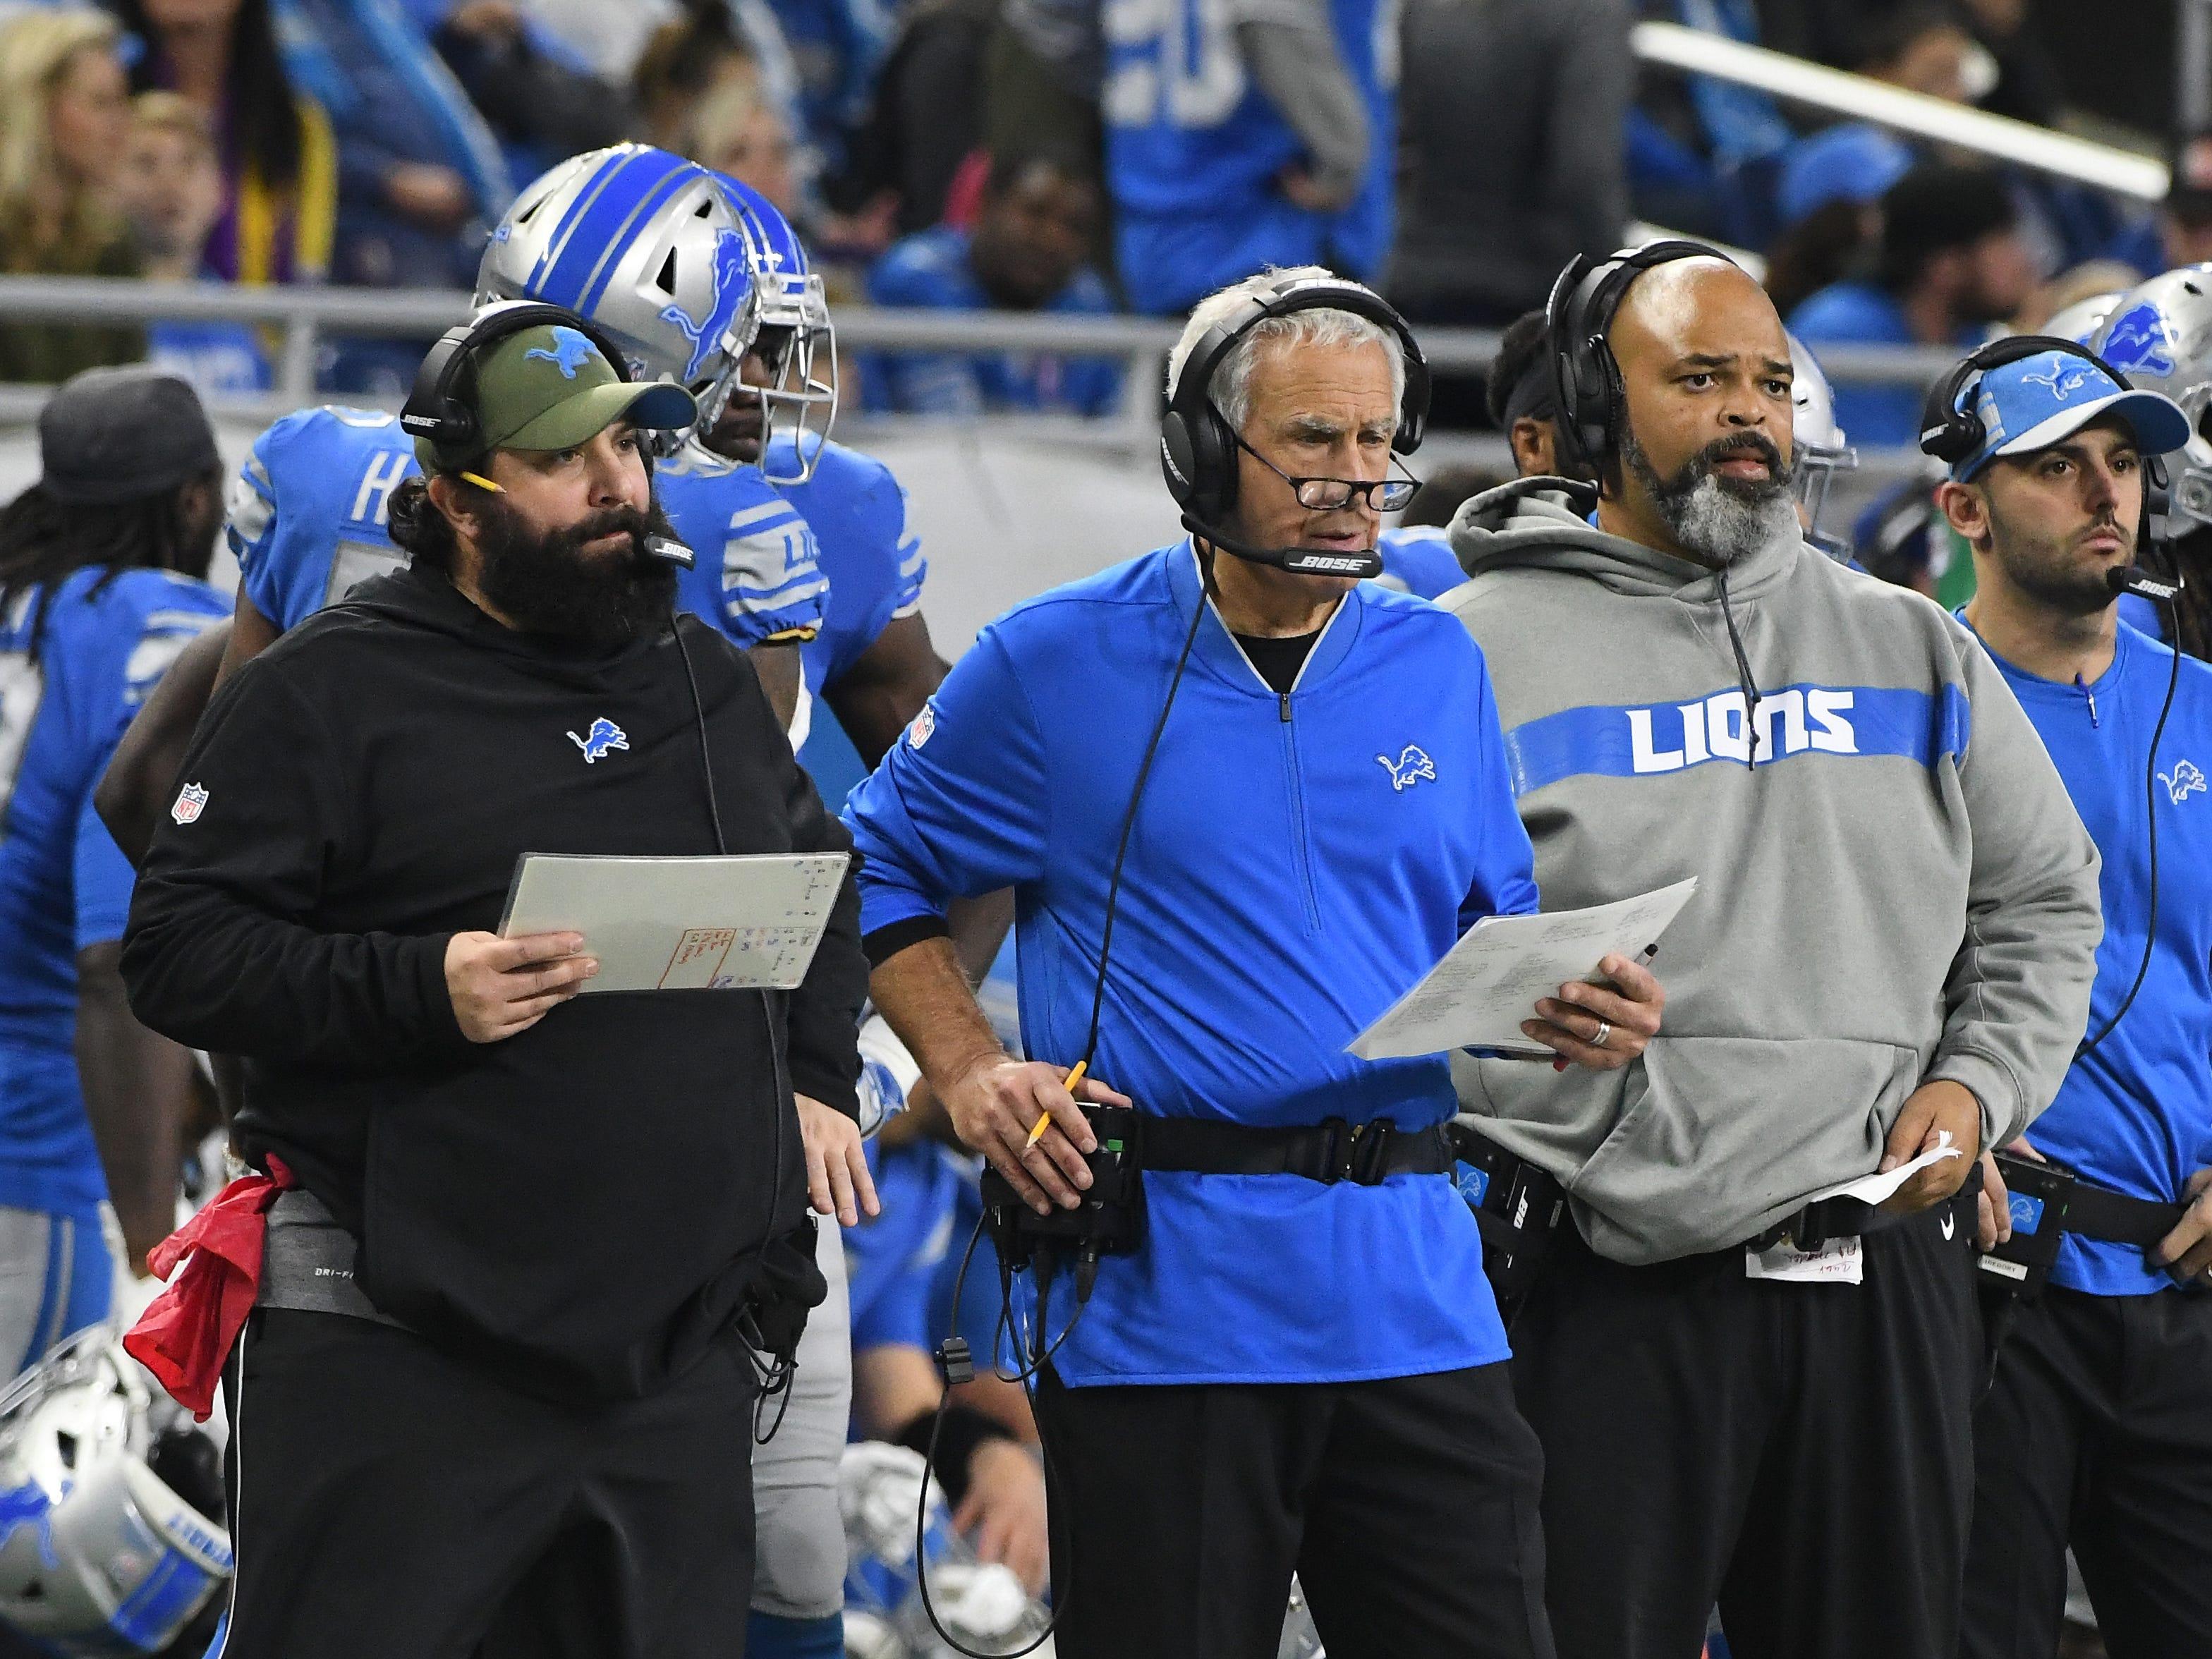 Lions head coach Matt Patricia, defensive coordinator Paul Pasqualoni and defensive line coach Bo Davis on the sidelines in the fourth quarter.